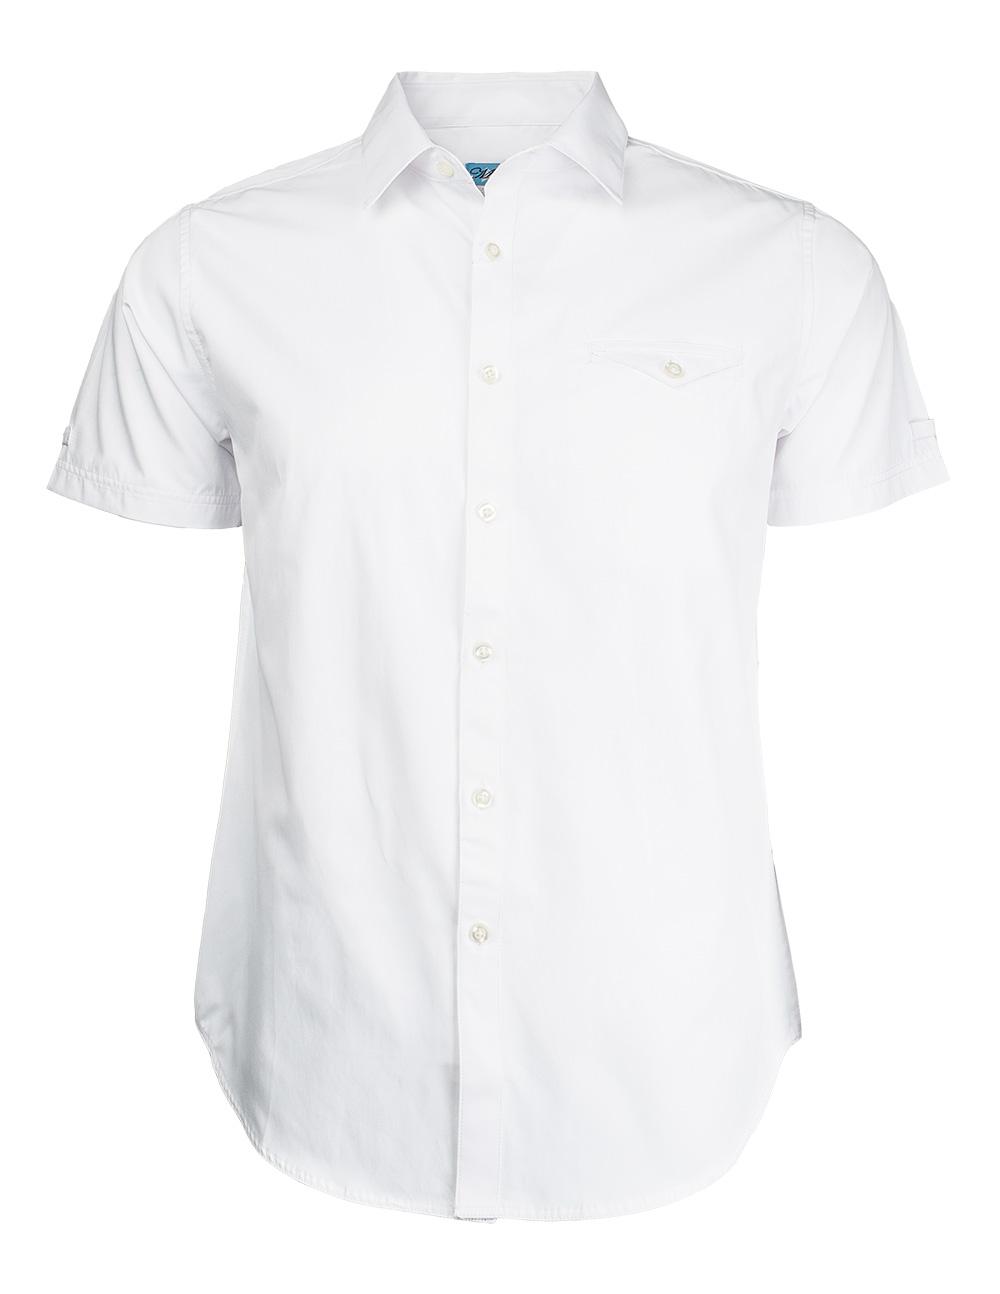 17208 - White